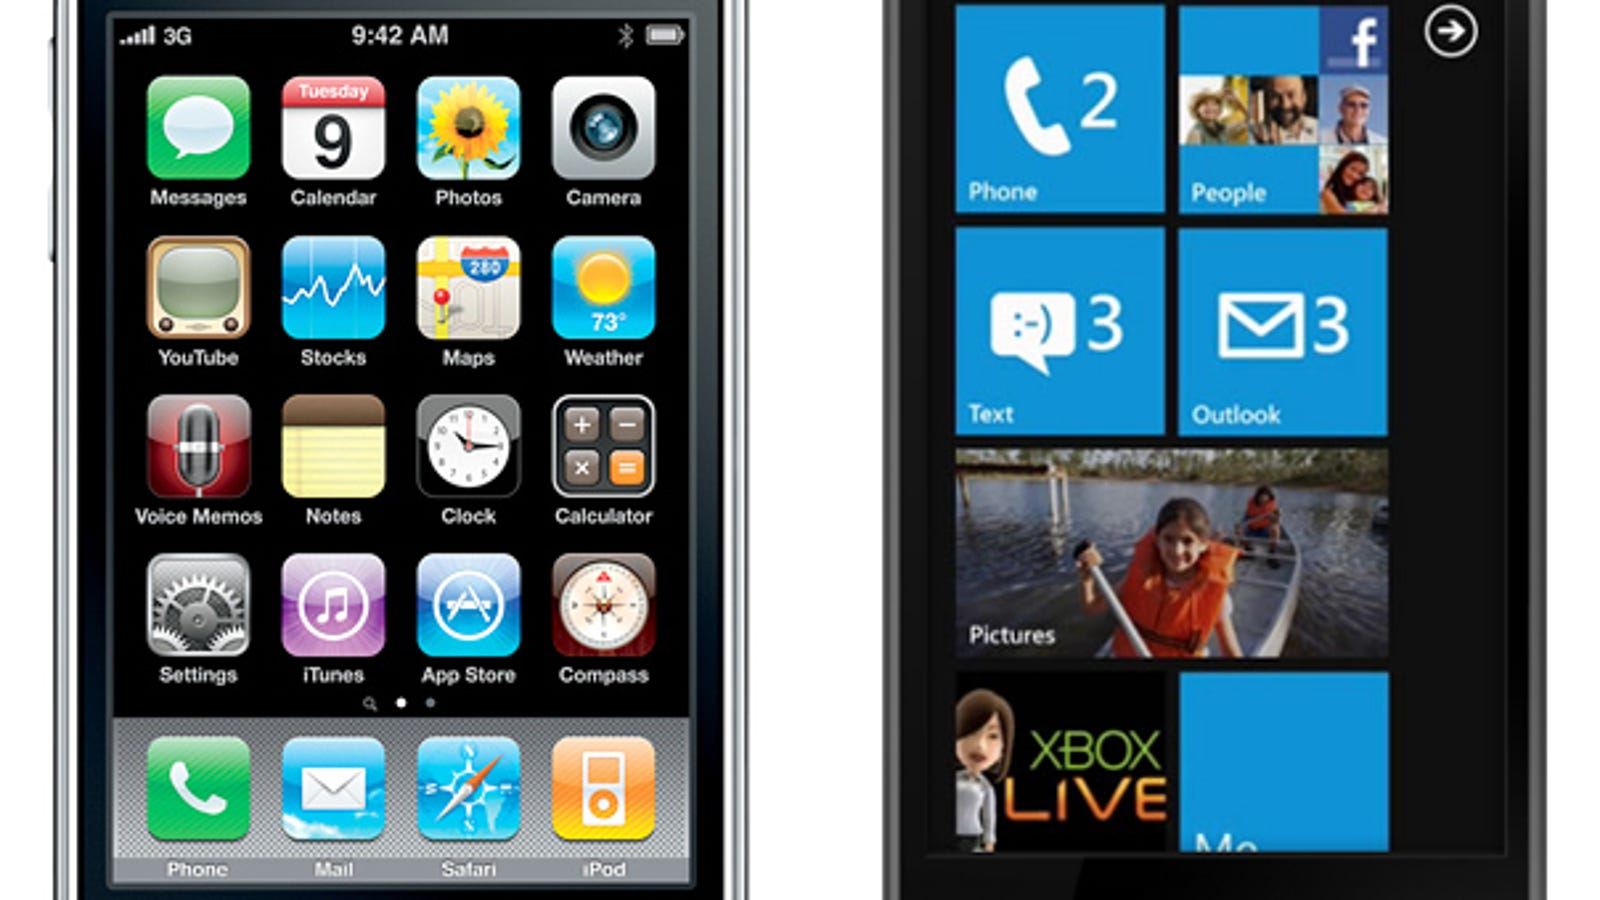 Windows phone 7 app store